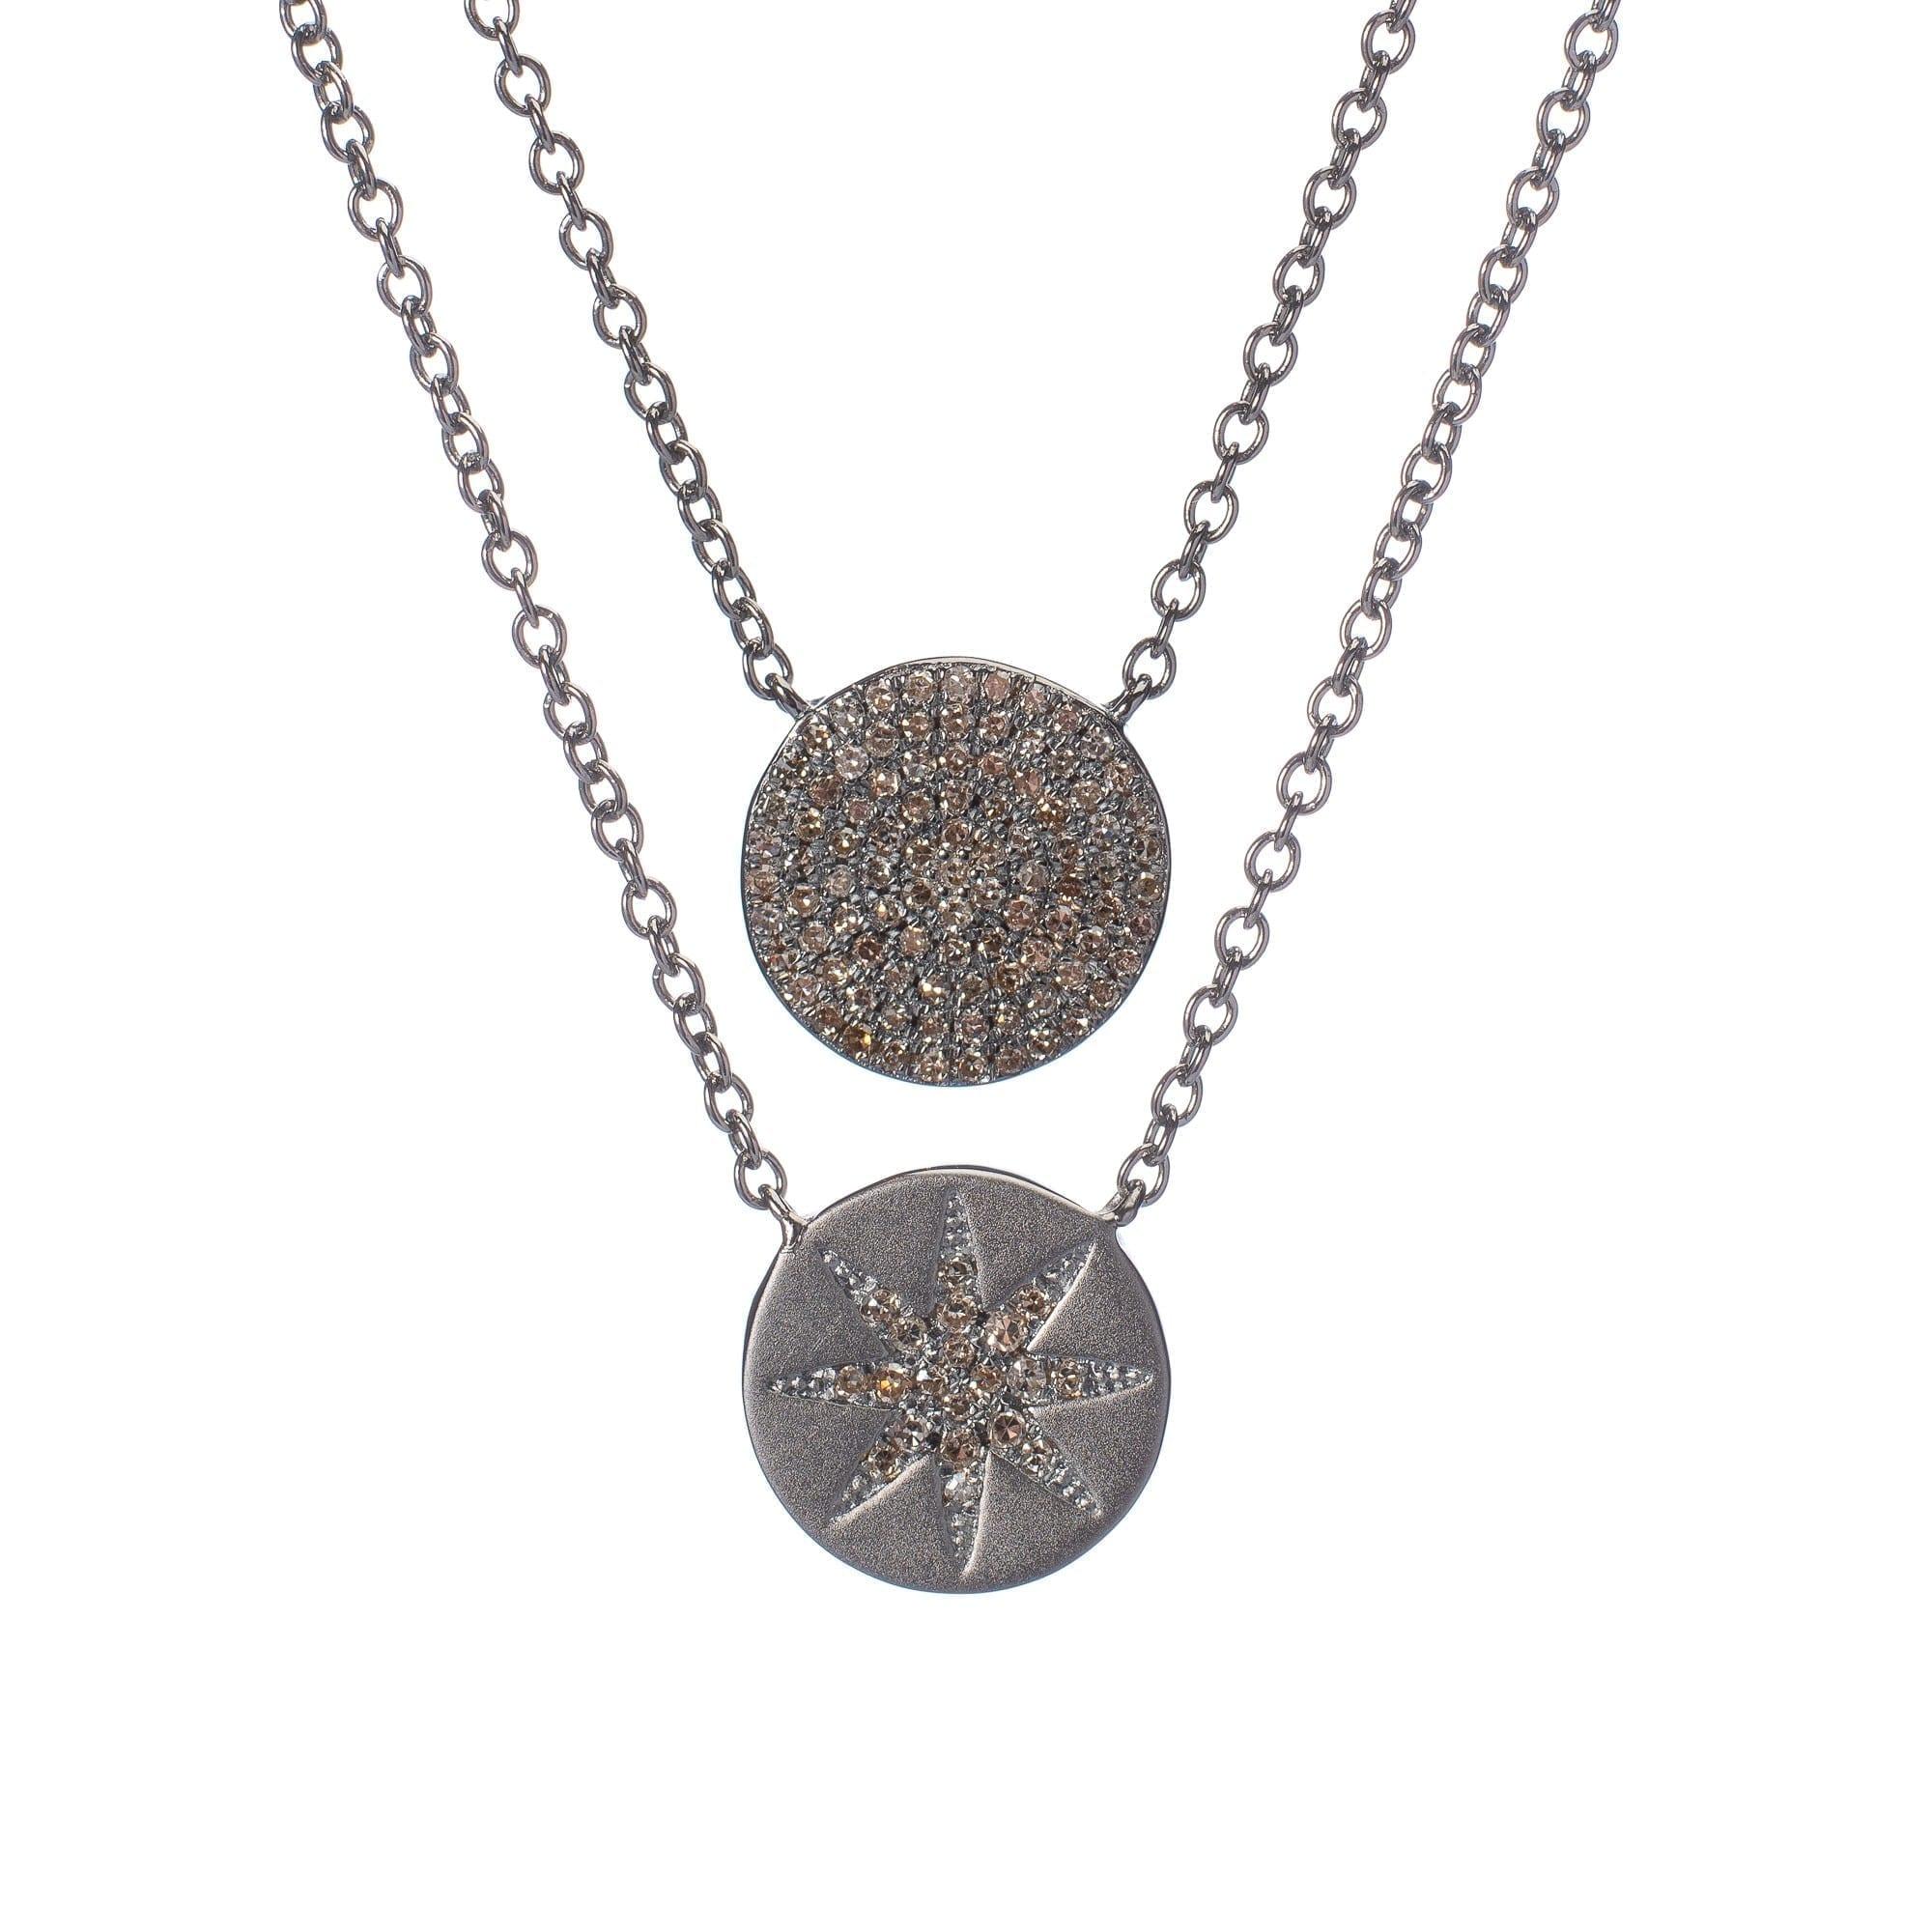 2-Sided Diamond Sunburst Disc Necklace